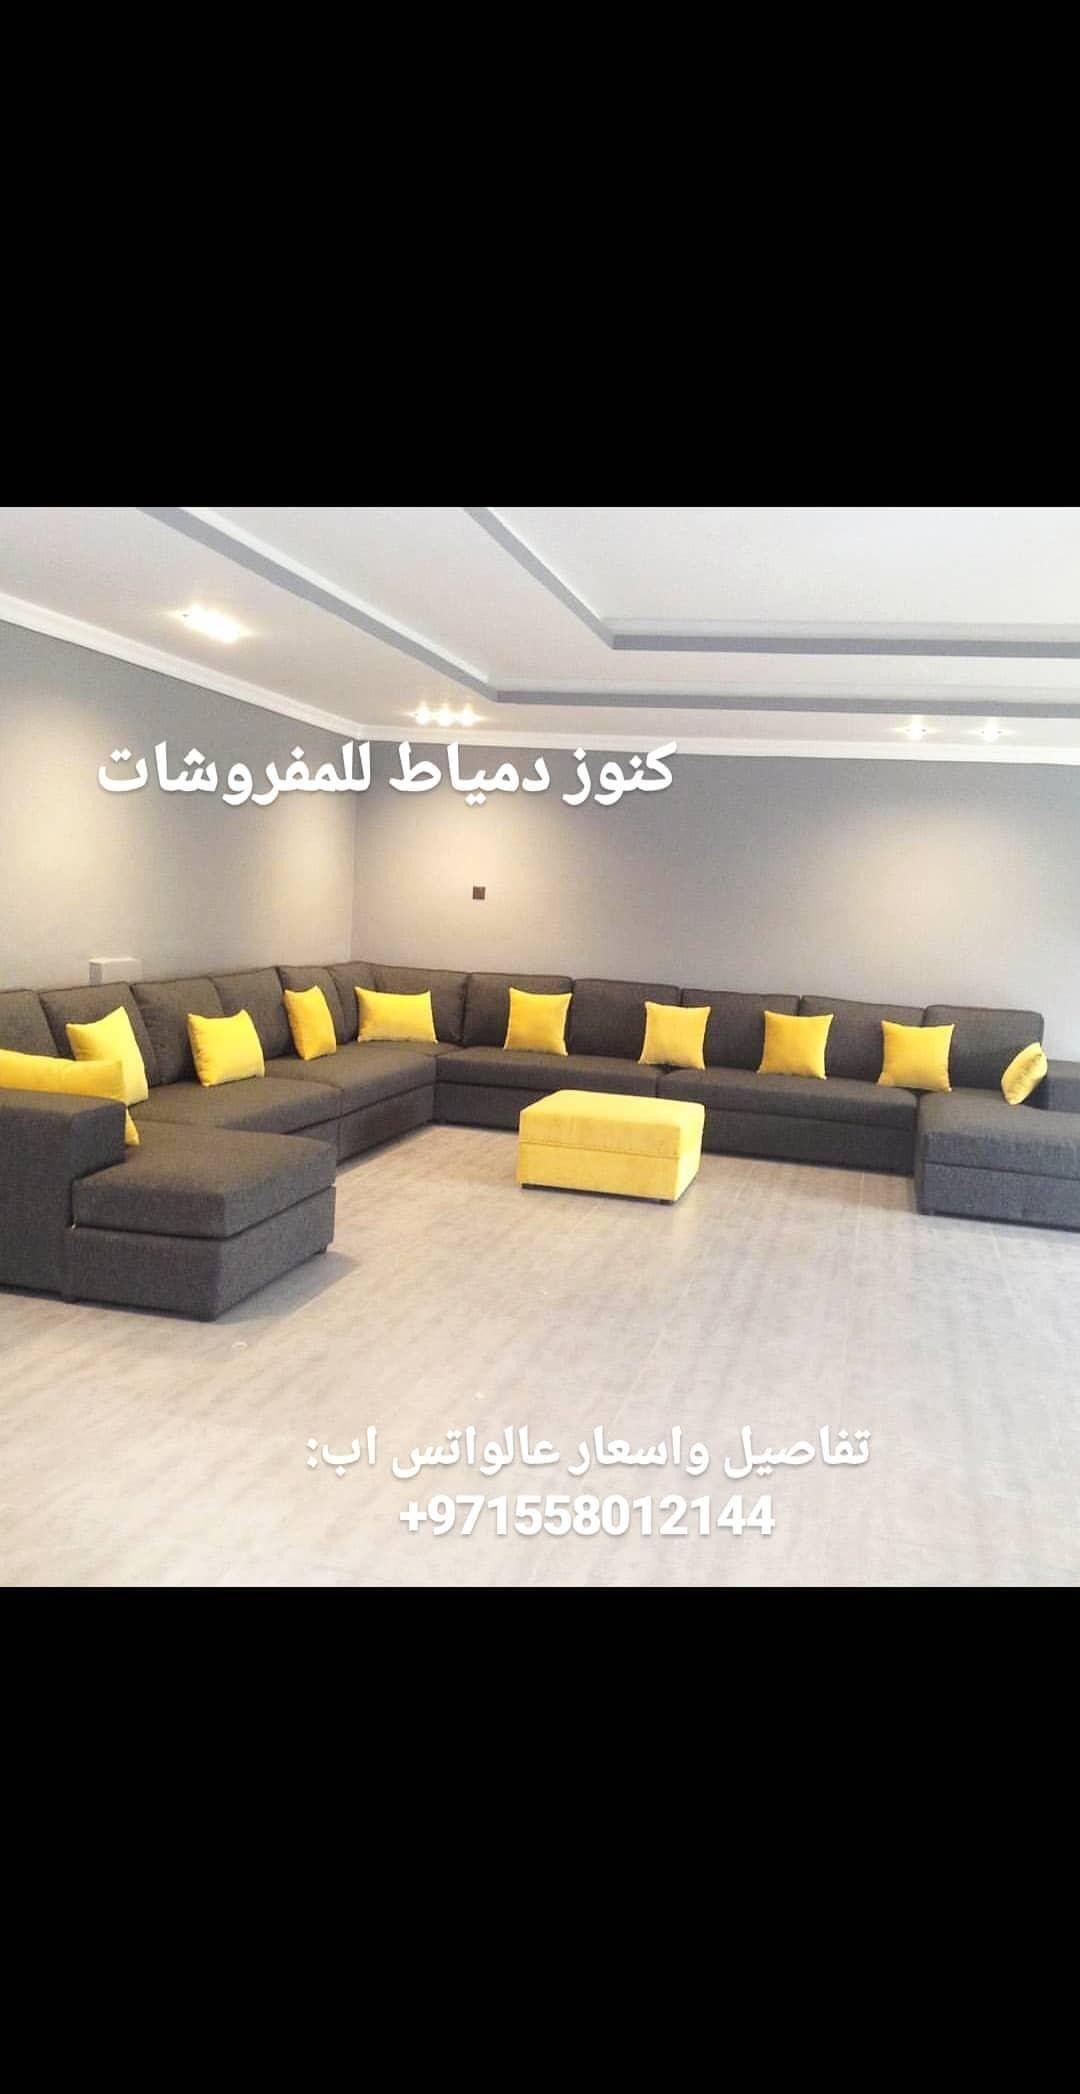 Pin By Knooz Dumyat Furniture On منزل Home Decor Kitchen Room Decor